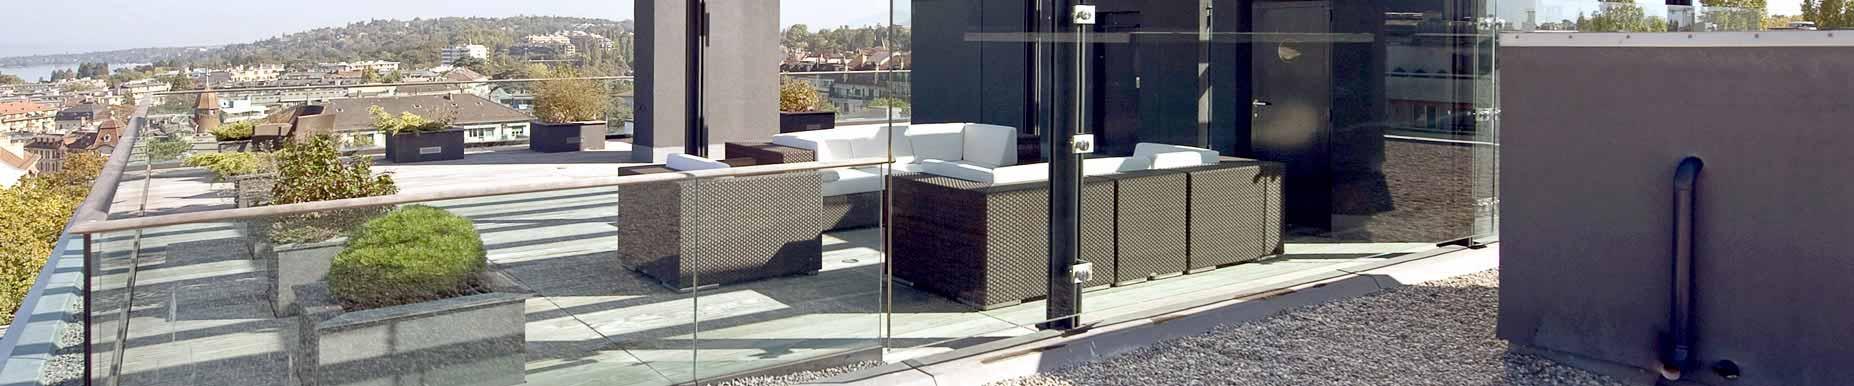 Sud-etancheite-nimes-toit-terrasse-2